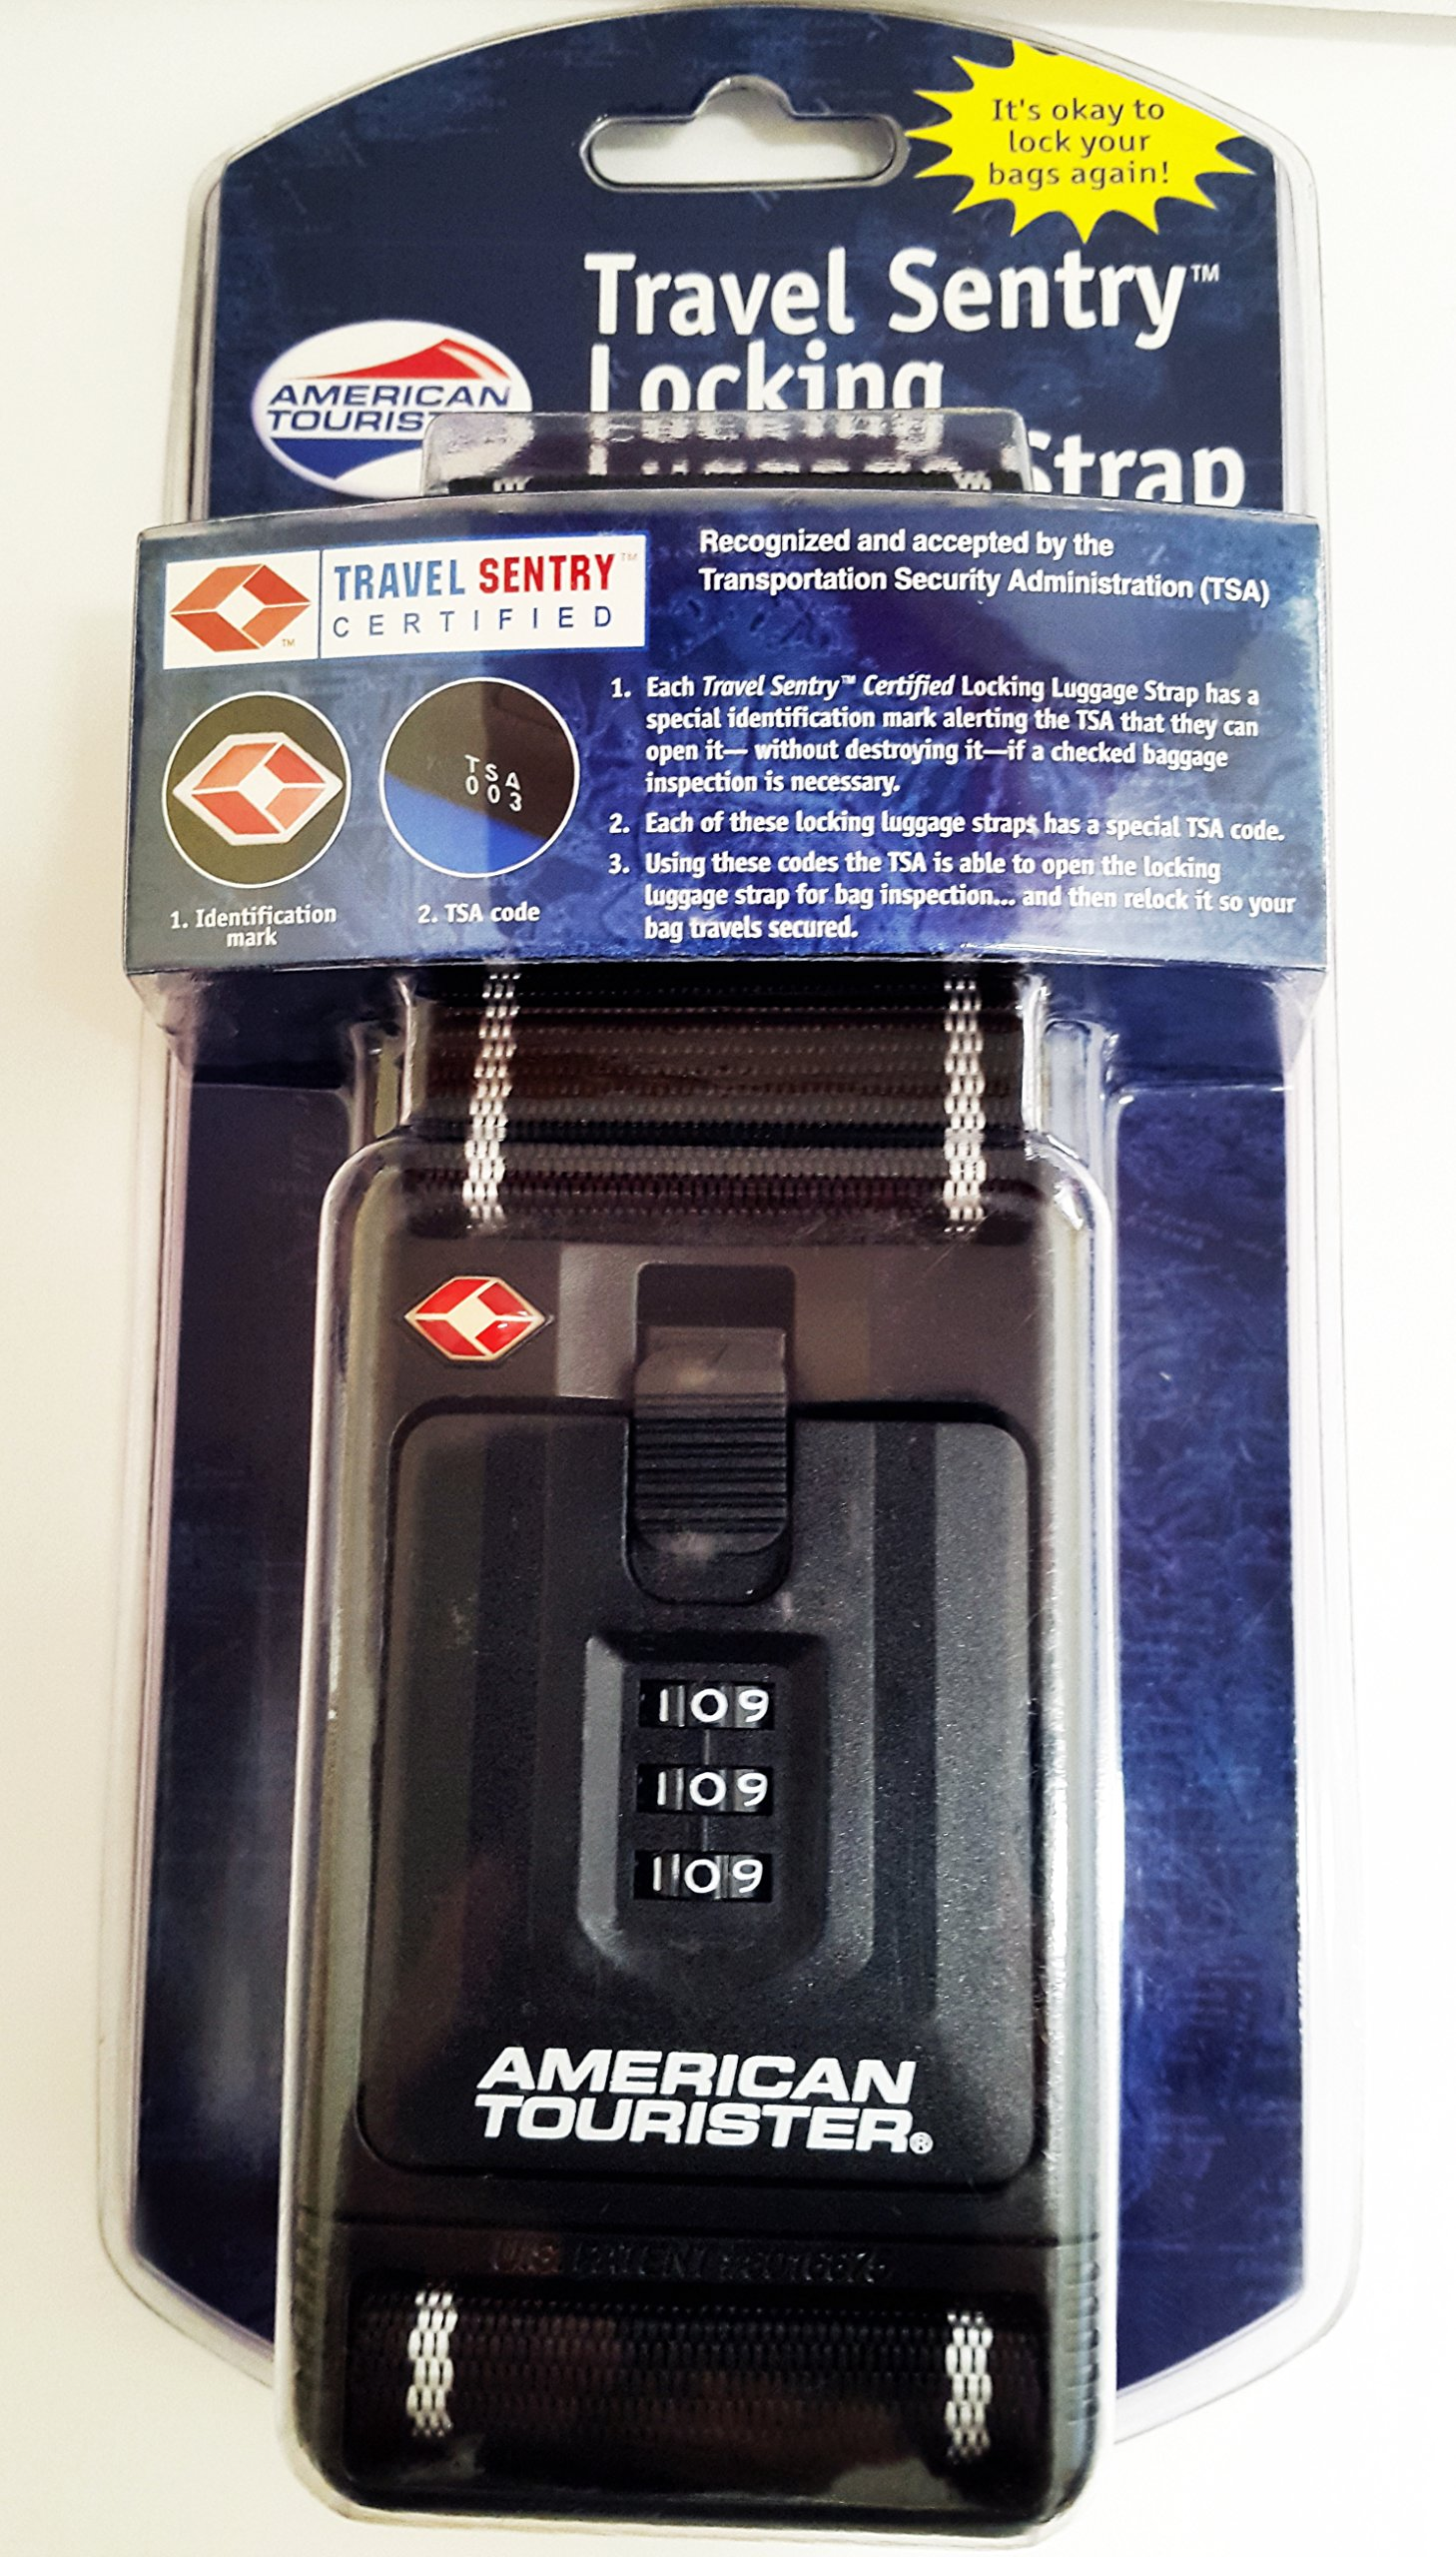 Travel Sentry Locking Luggage Strap with TSA Code